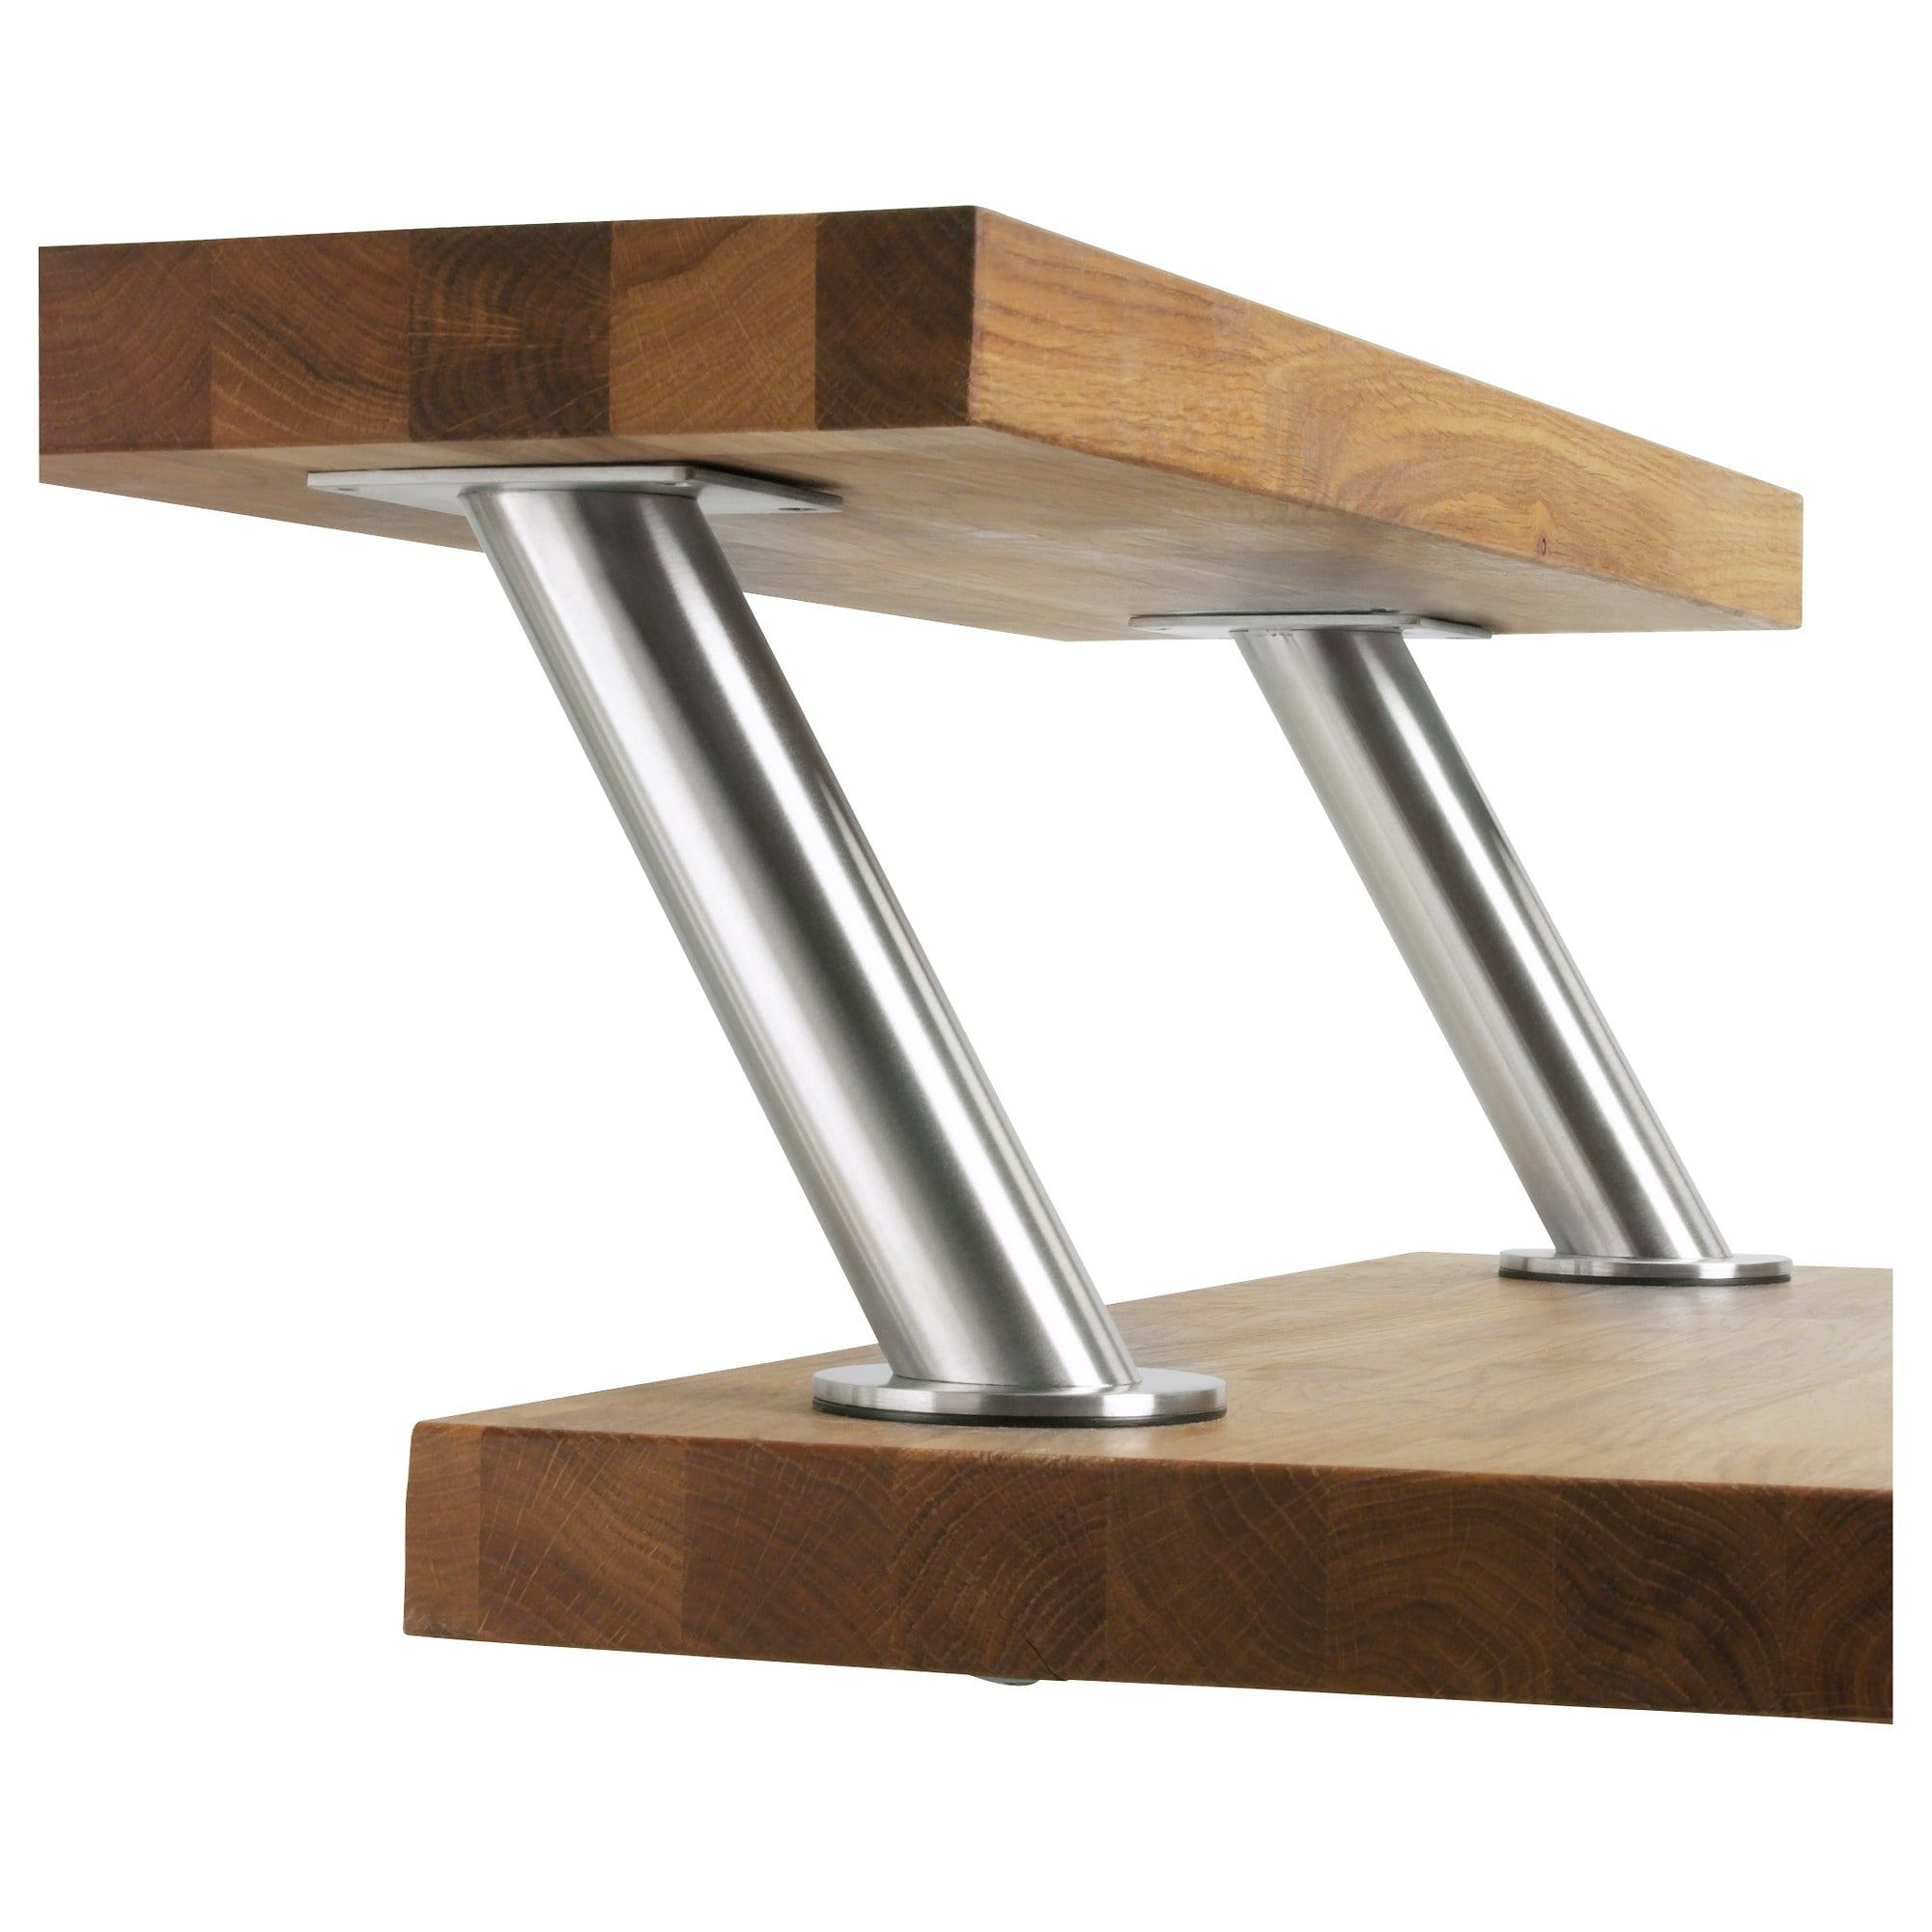 Tavolino Che Diventa Tavolo Ikea tavolo acciaio inox ikea